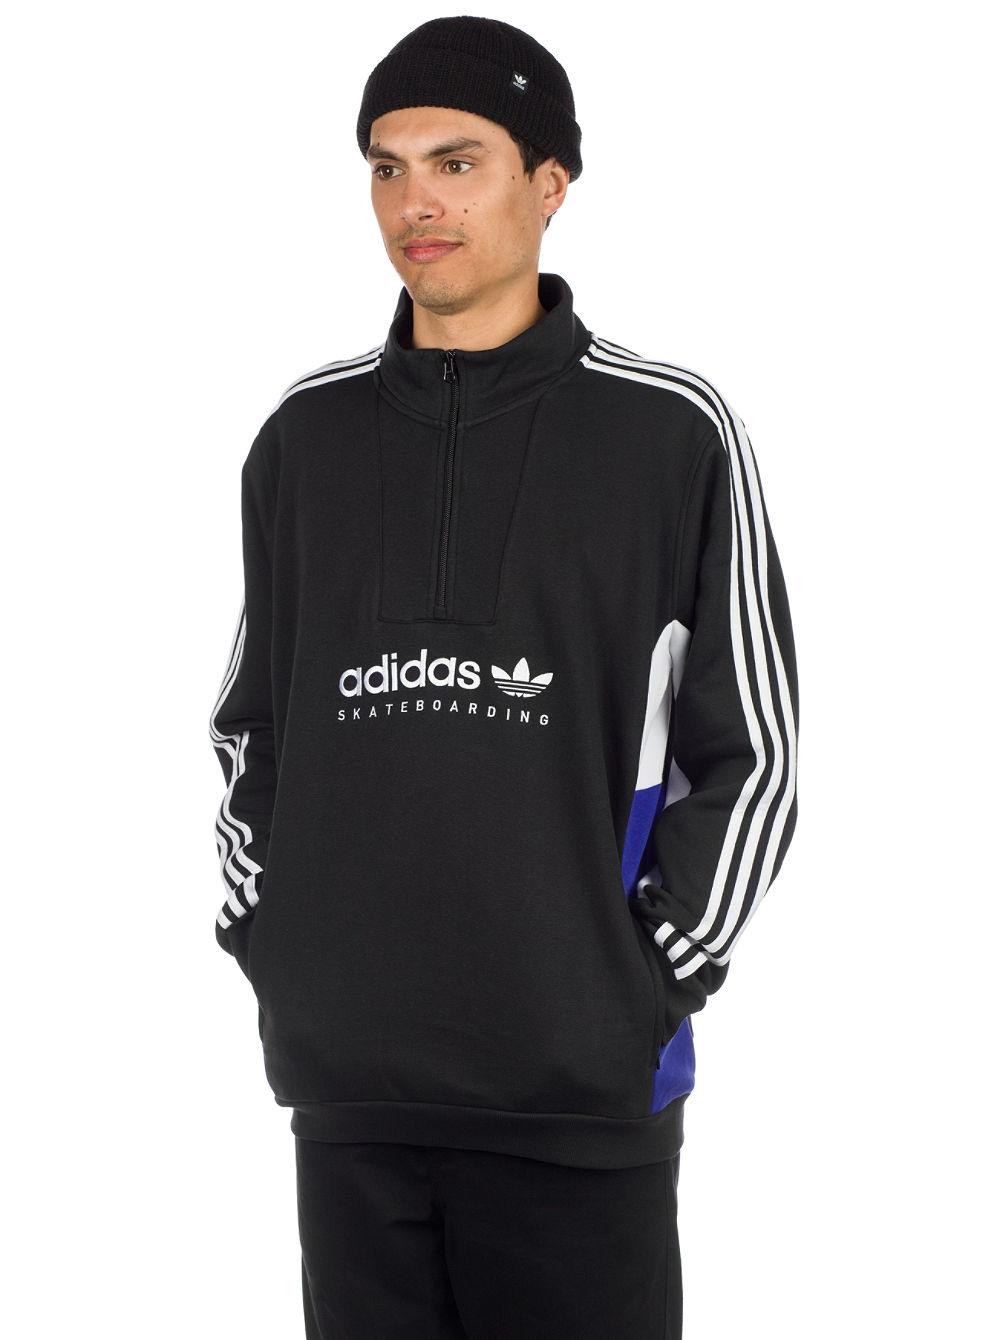 1ae66ad292 Buy adidas Skateboarding Apian Sweater online at blue-tomato.com